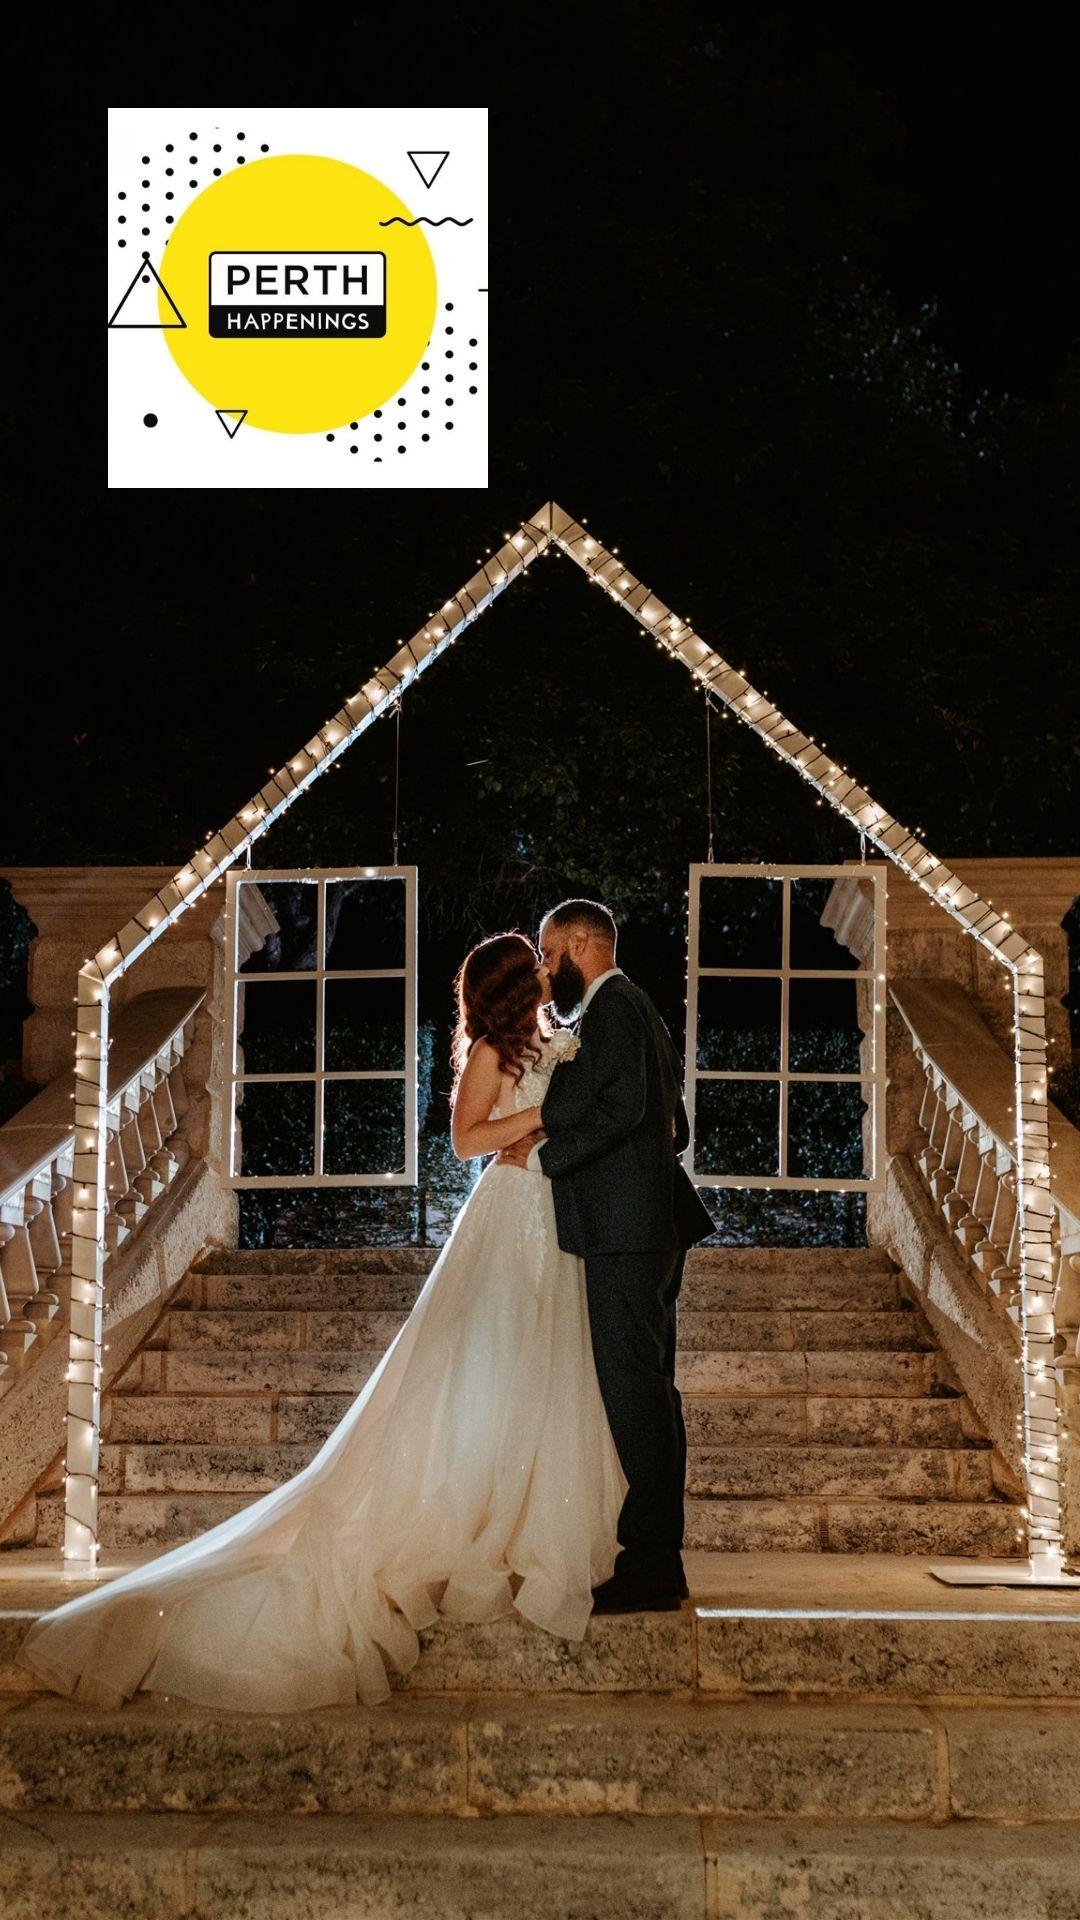 Perth happenings covid 19 wedding elopement wedding planner